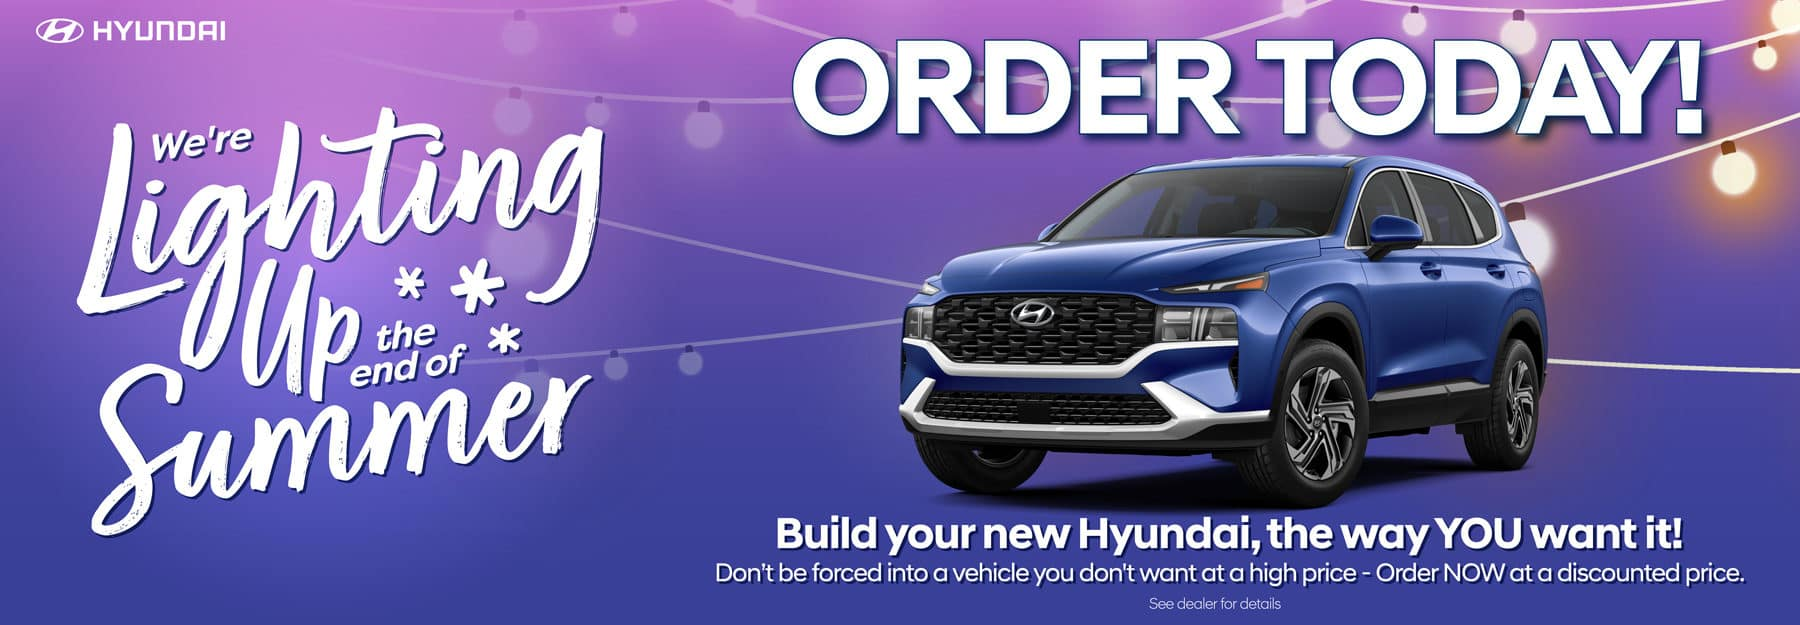 GHFHY-0821-003805-1-Hyundai-September-HPG-1800×6252